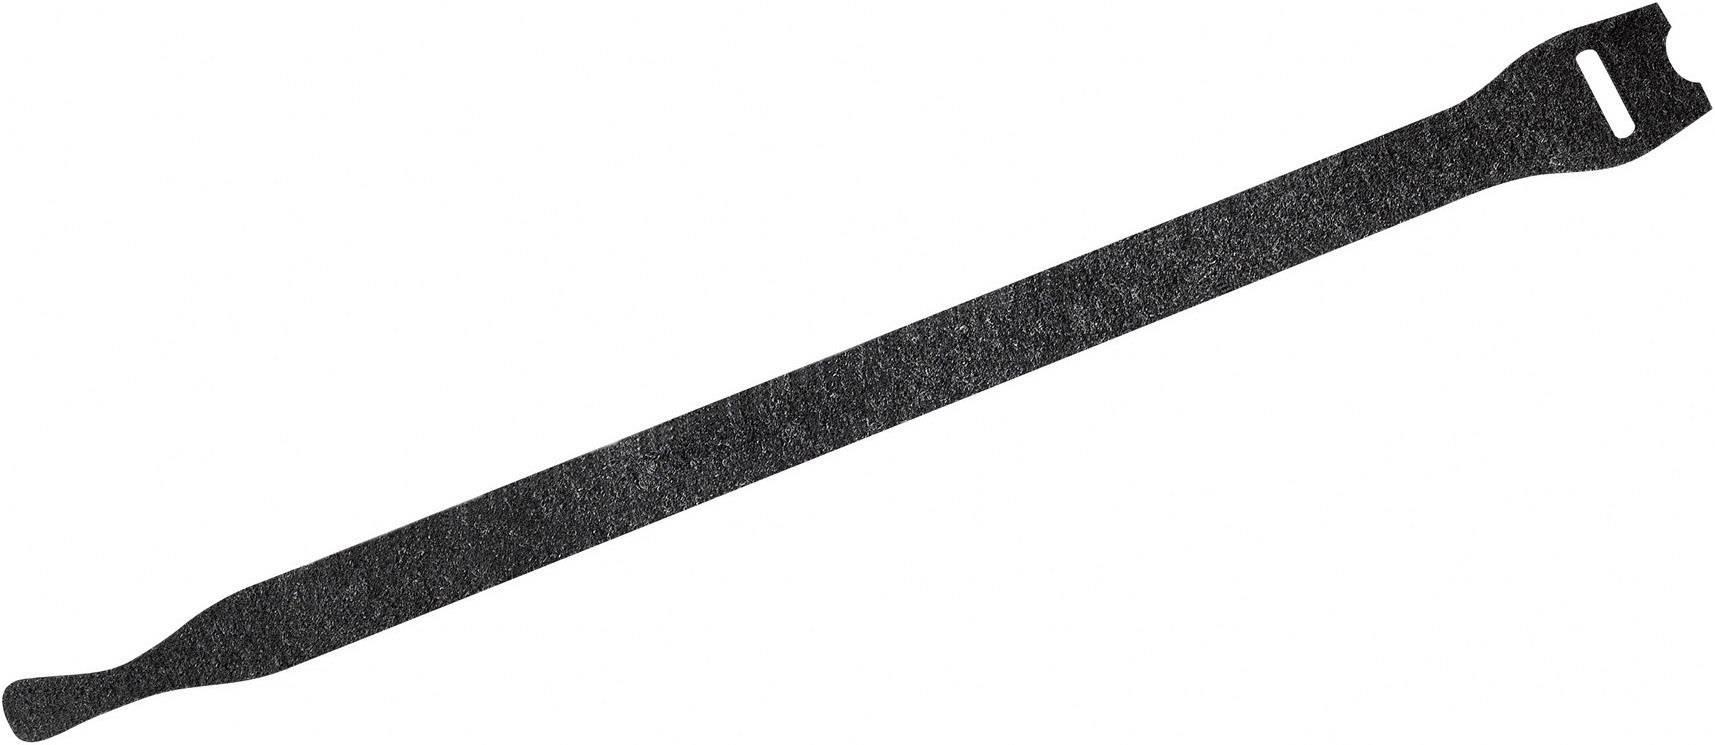 Káblový manažér na suchý zips Fastech 802-330, (d x š) 200 mm x 13 mm, čierna, 10 ks